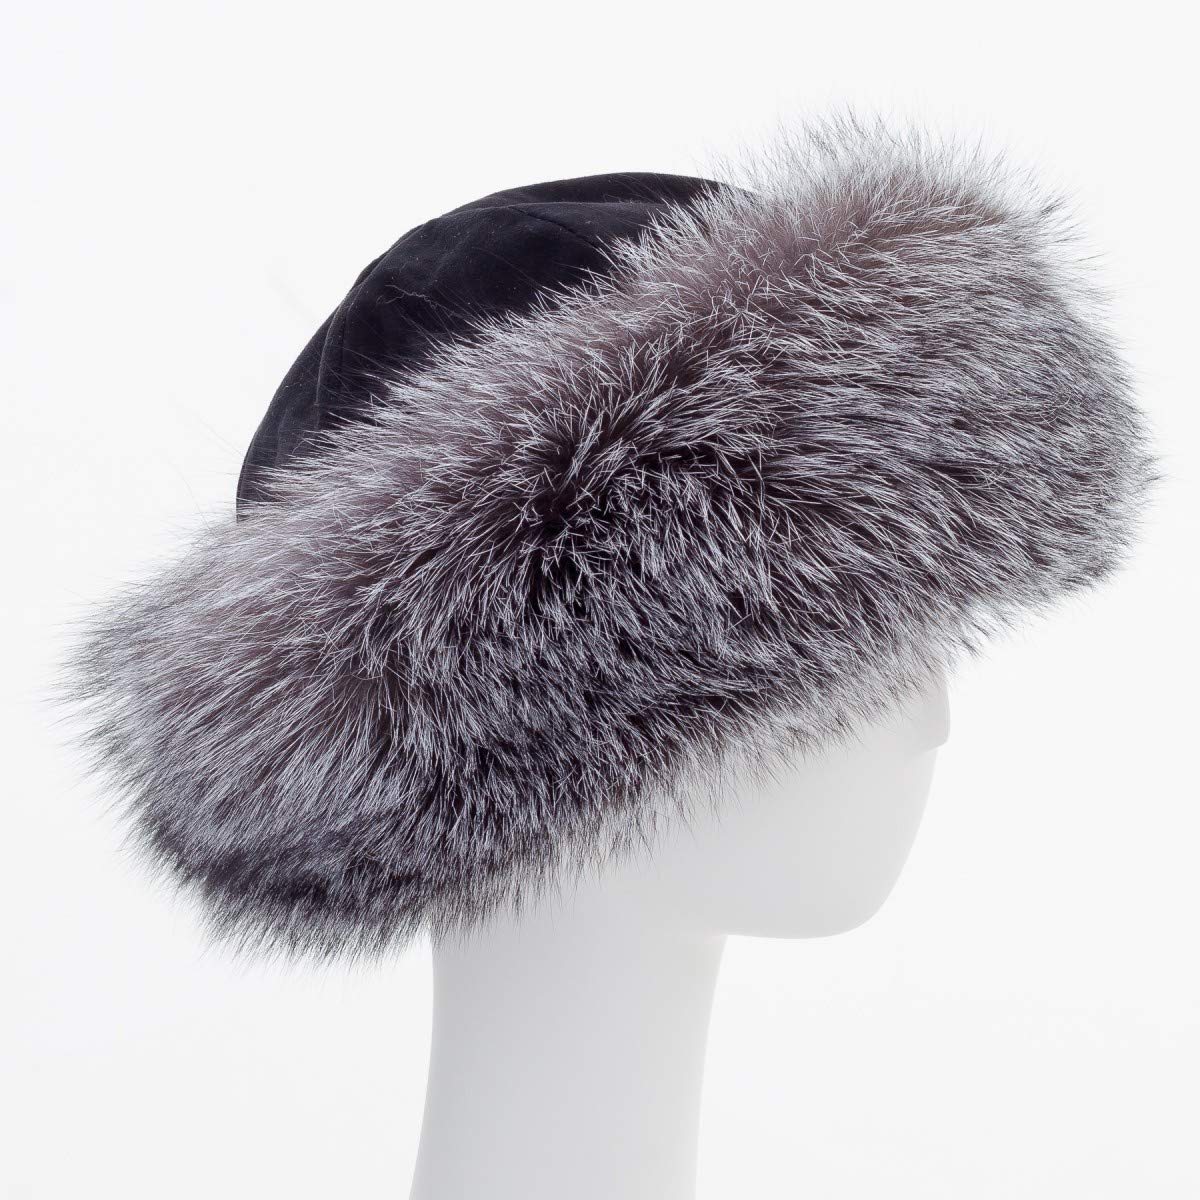 surell Fox Cuff Winter Hat - Warm Winter Fashion - Bridal Wedding Attire Black by surell (Image #3)